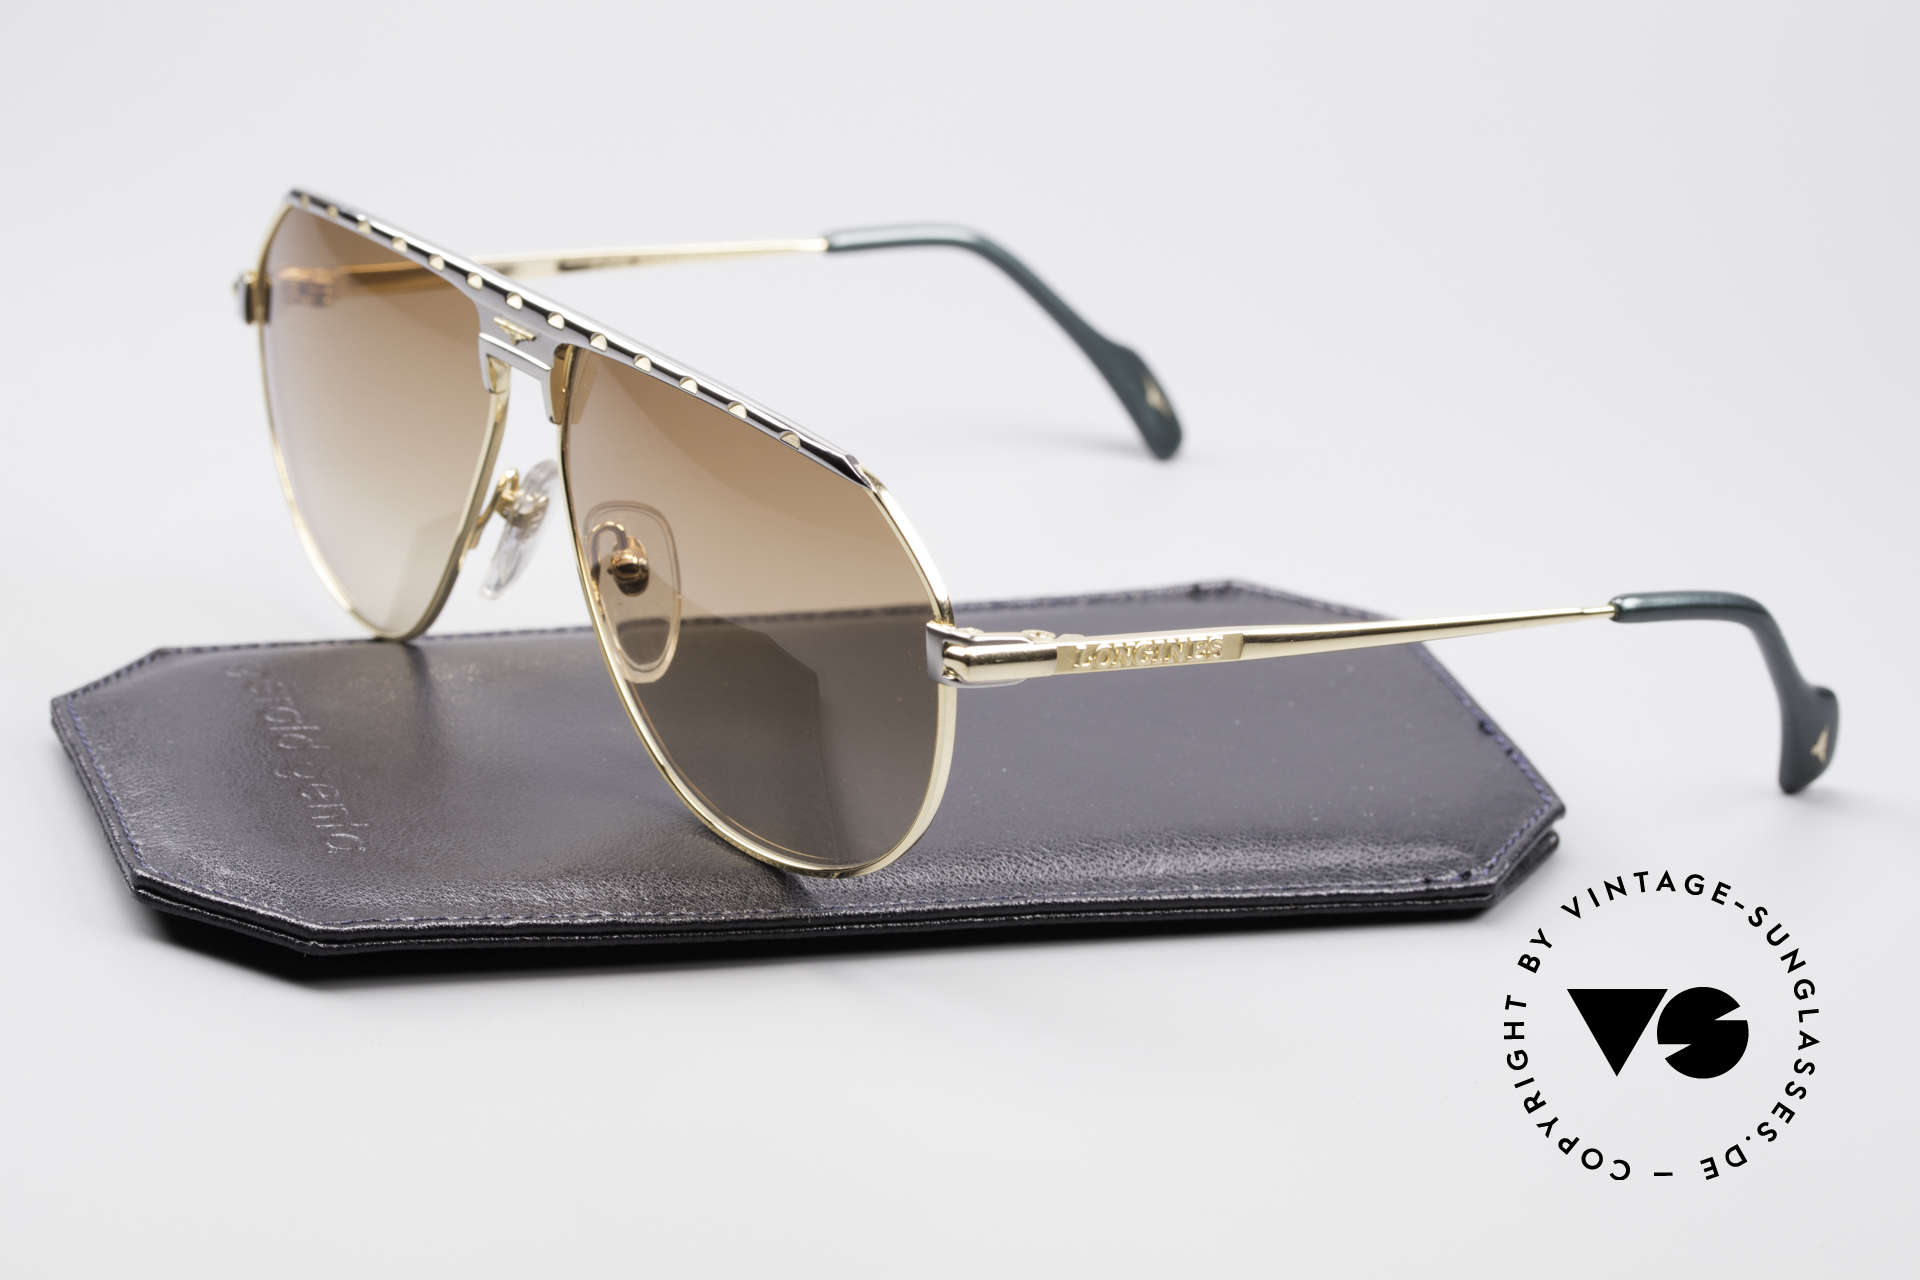 Longines 0151 Large 80's Titanium Sunglasses, noble frame coloring (gentlemen like); truly vintage, Made for Men